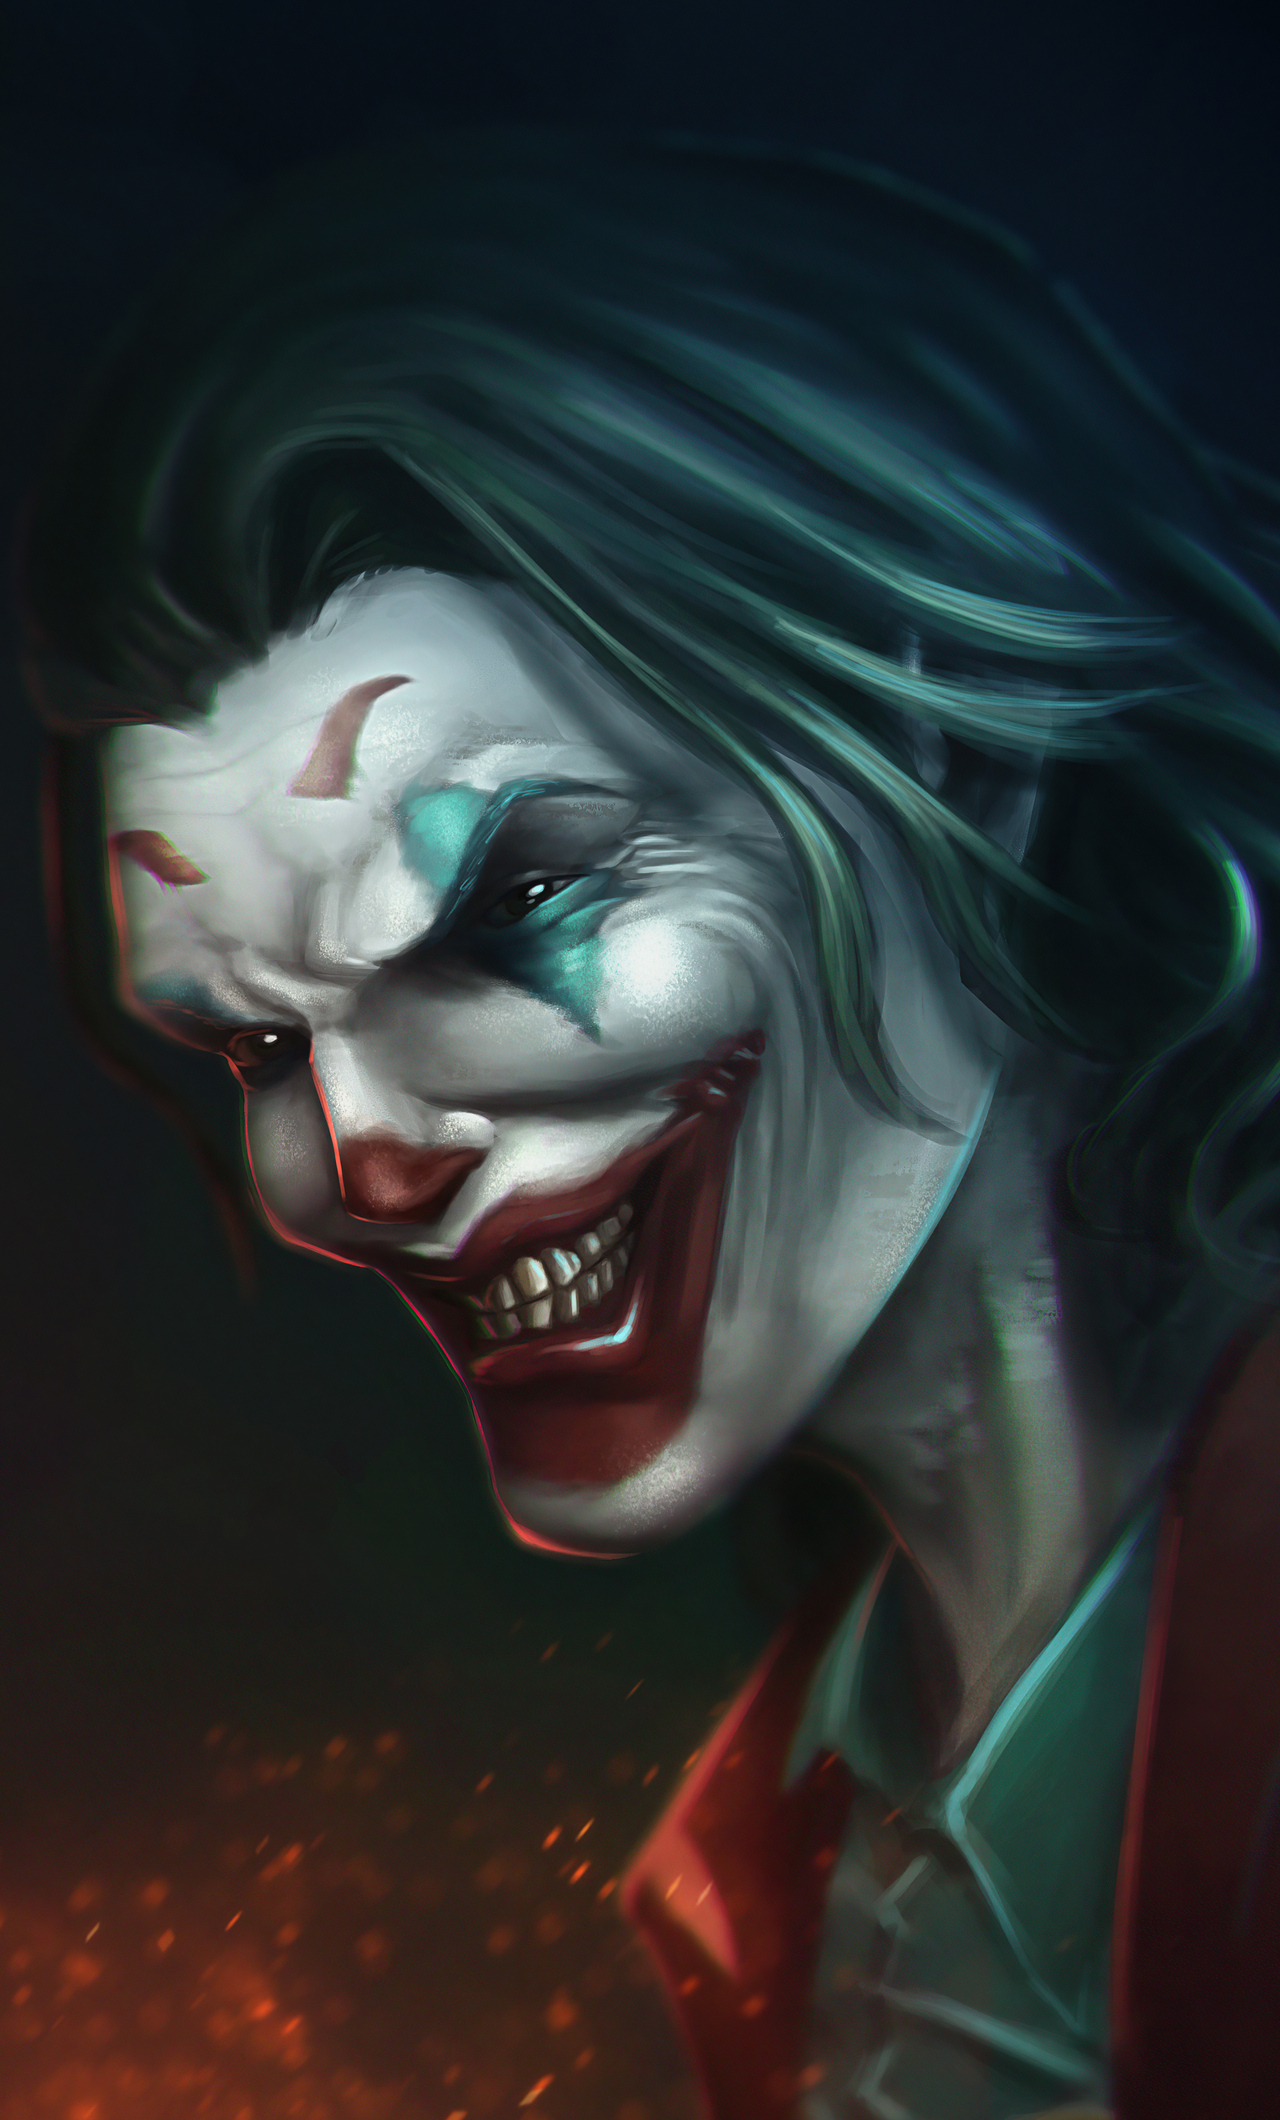 1280x2120 Joker 2020 Art 4k iPhone 6+ HD 4k Wallpapers ...